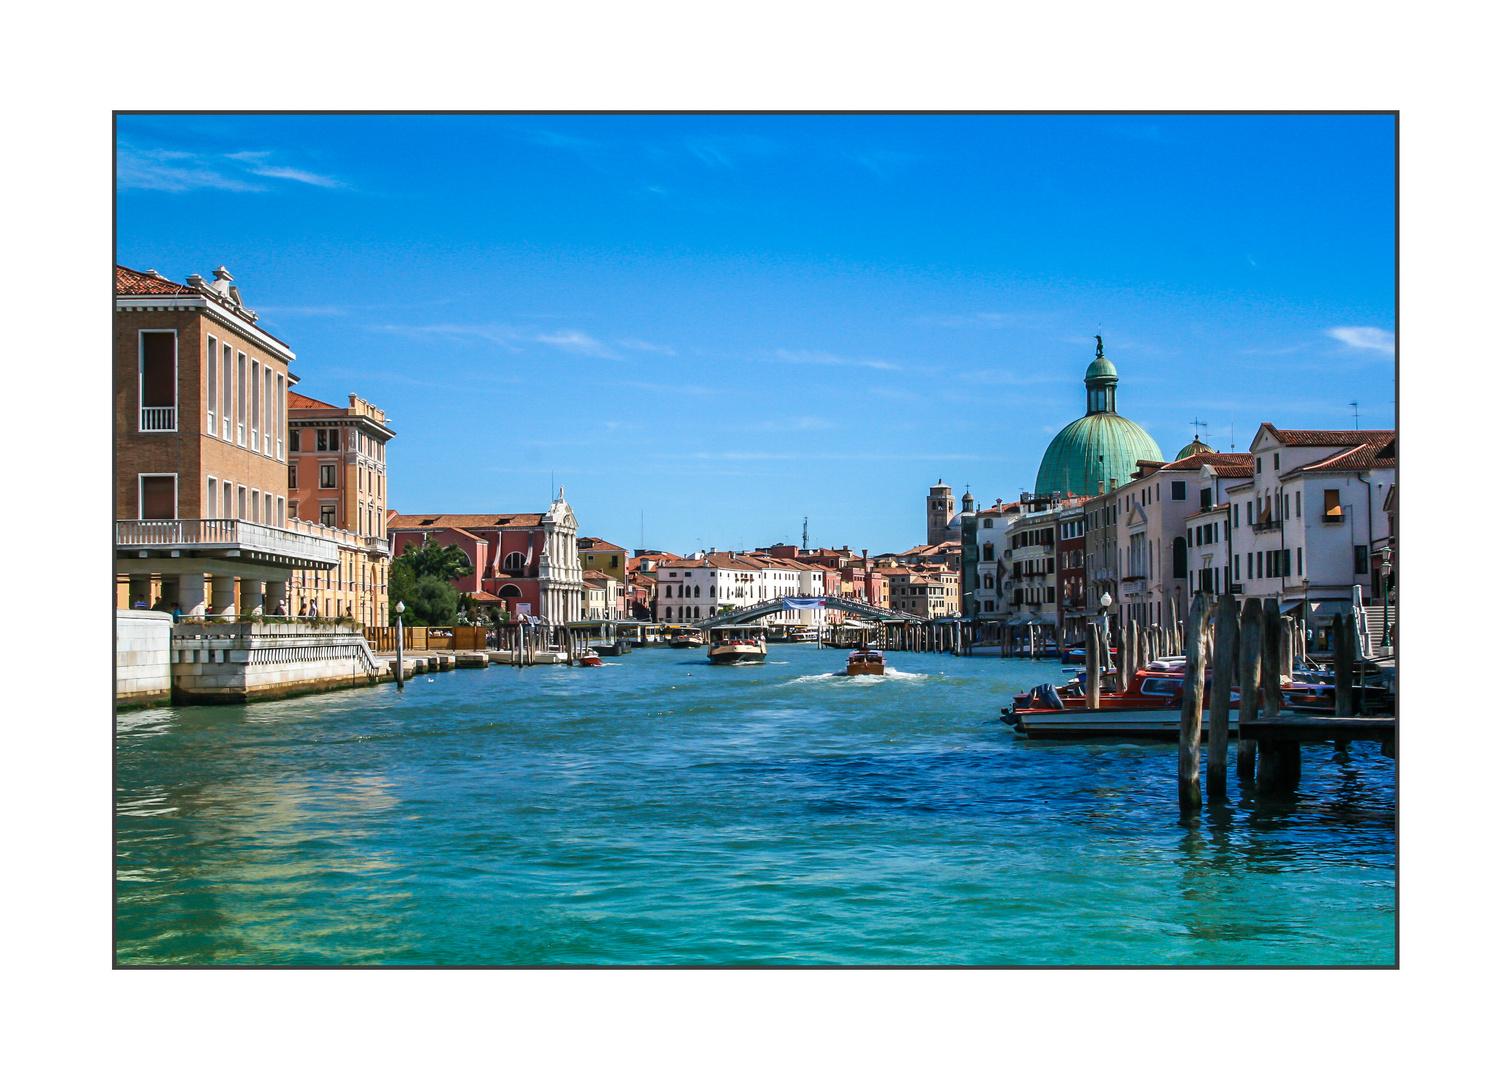 sch nes venedig foto bild europe italy vatican city. Black Bedroom Furniture Sets. Home Design Ideas